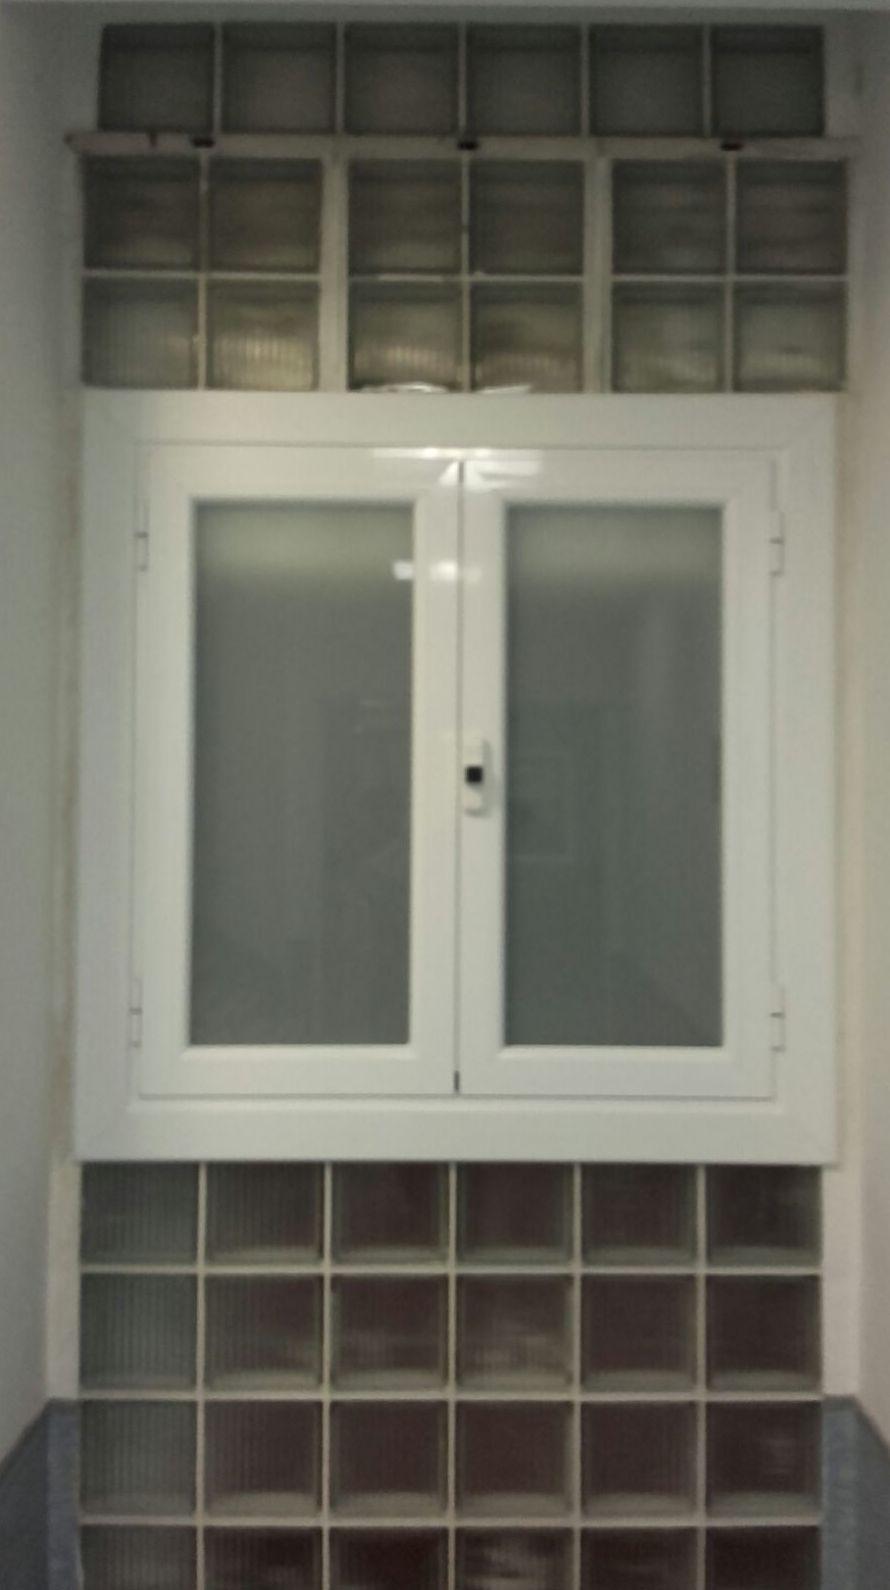 ventana con manilla desmontable